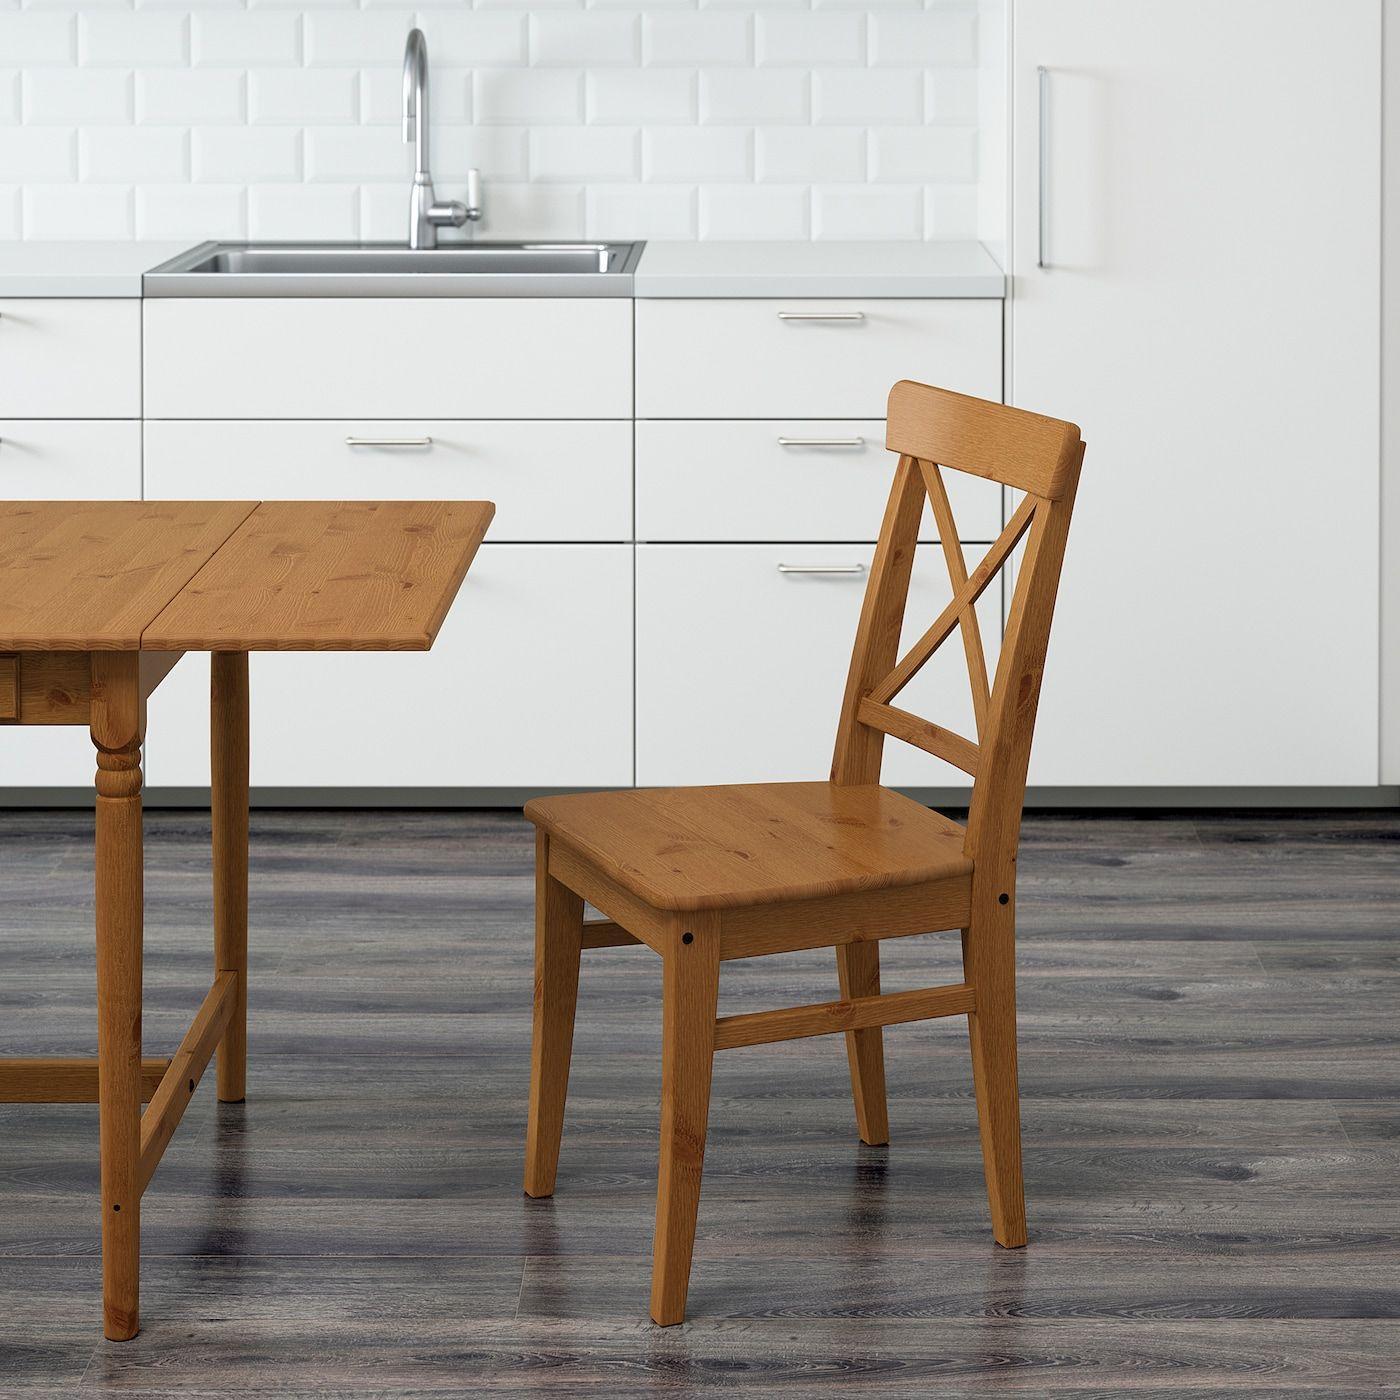 Ikea Holzstuhl Schwarz